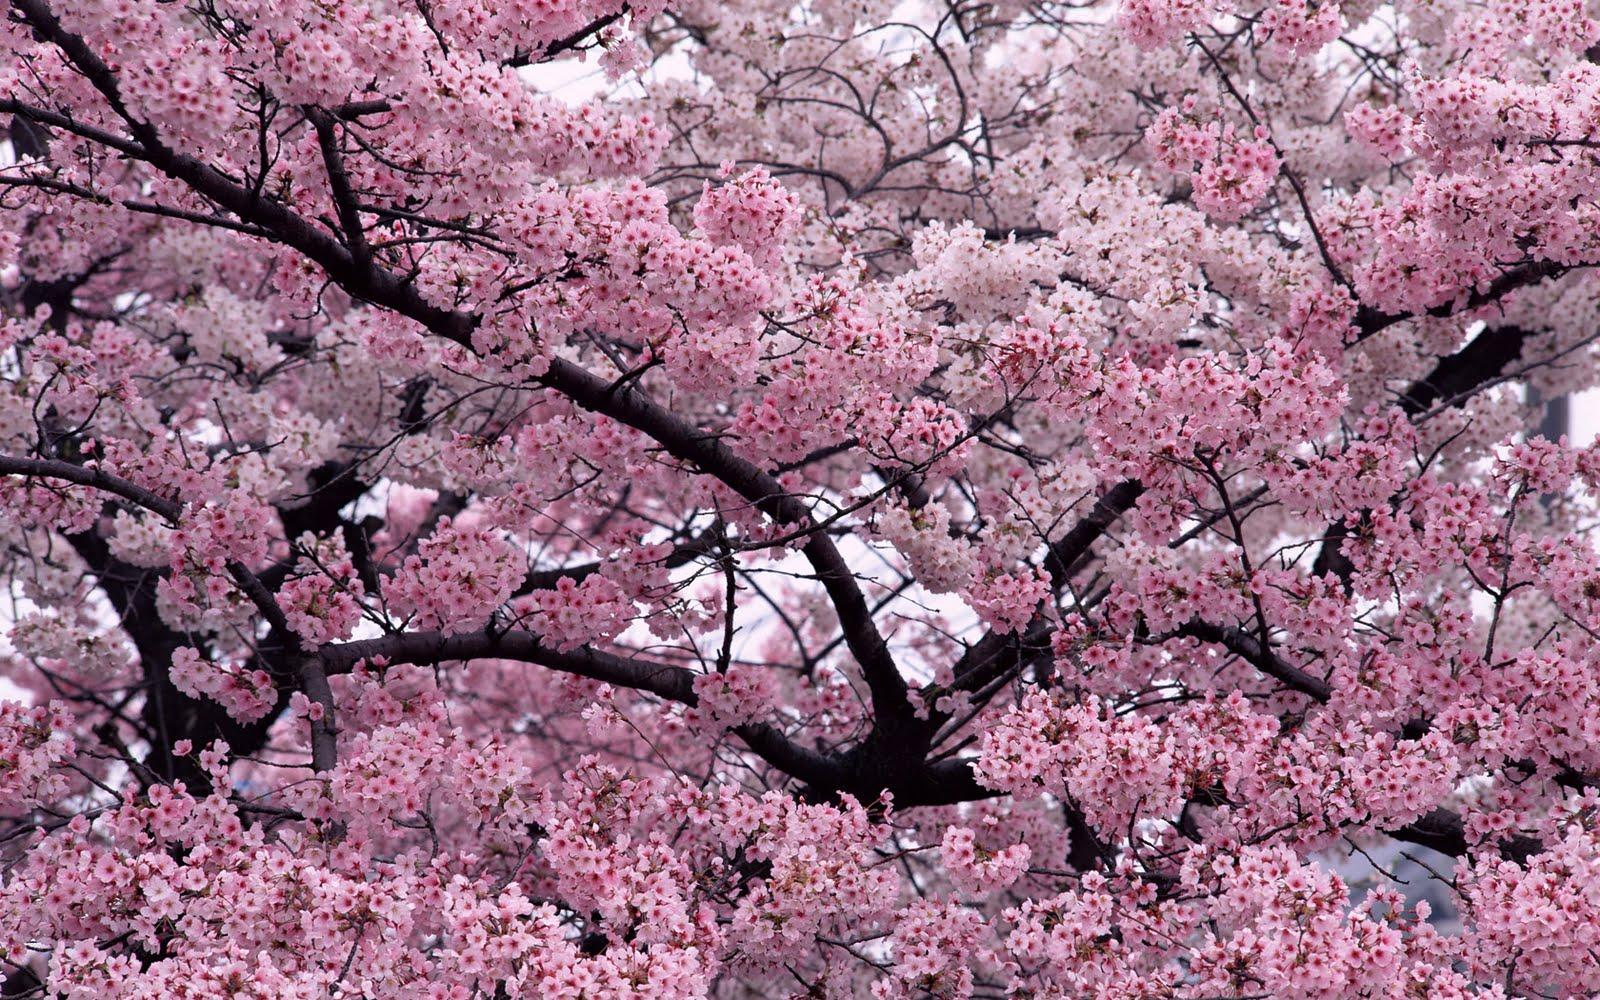 http://3.bp.blogspot.com/-oL2X_geKbzY/TjlH87nklAI/AAAAAAAAAUM/O_-VLpamK7Q/s1600/tree-in-bloom-free_wallpapers.jpg